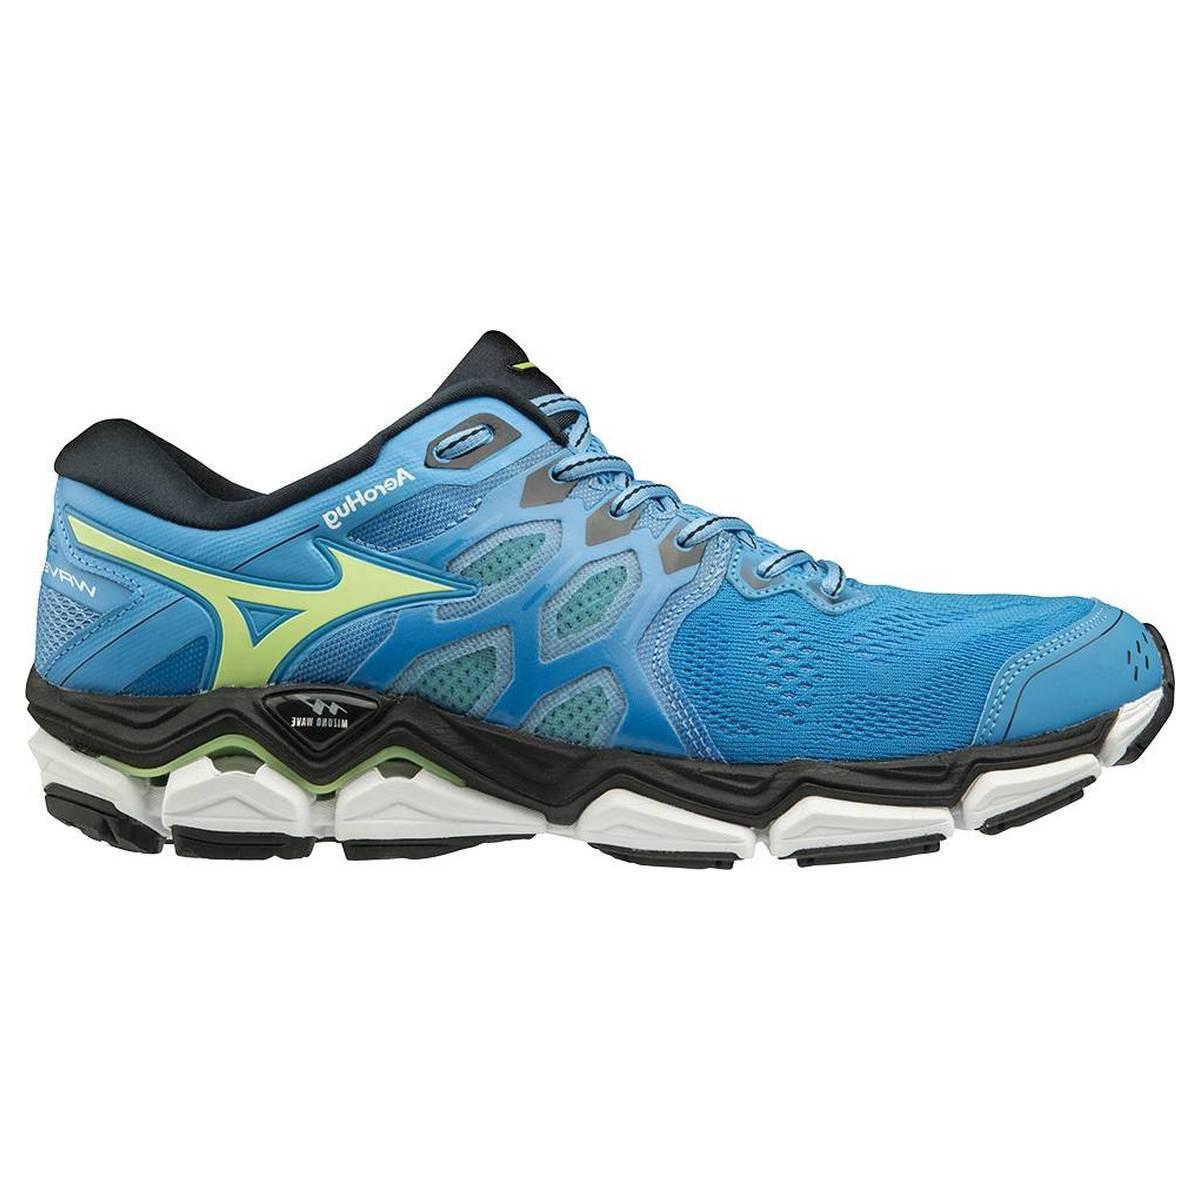 Mens Running Shoes Wave Horizon 3 A4 colore Light blue - Mizuno -  SportIT.com 75fd3bbad8c